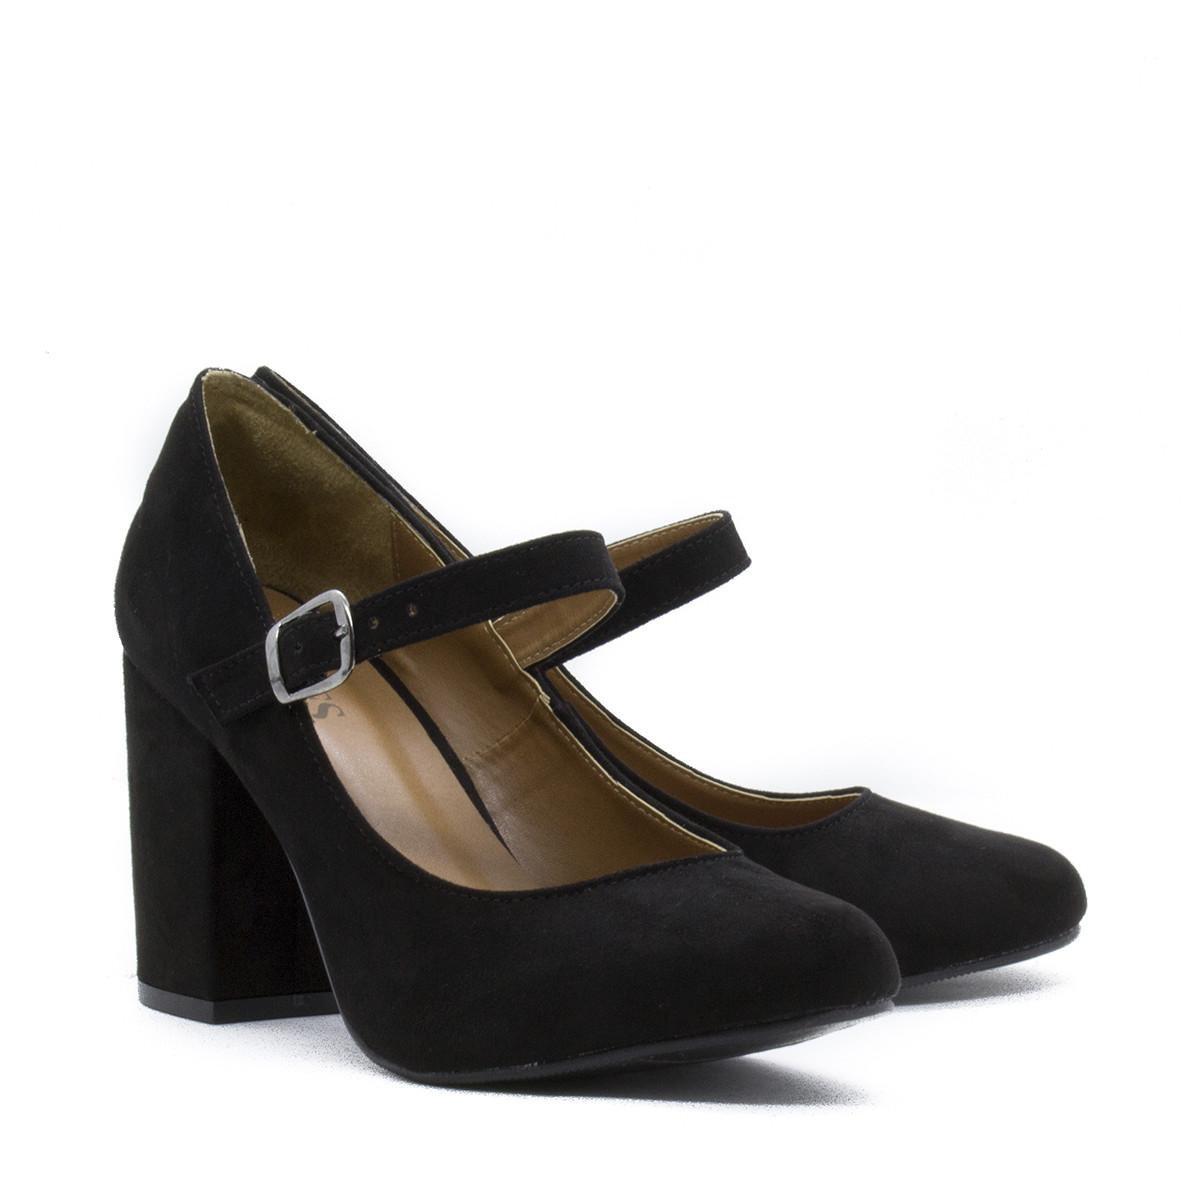 Preto Scarpin Feminino Inbox Shoes Jane Camurça Mary Scarpin Doll Shoes 7w7qFg